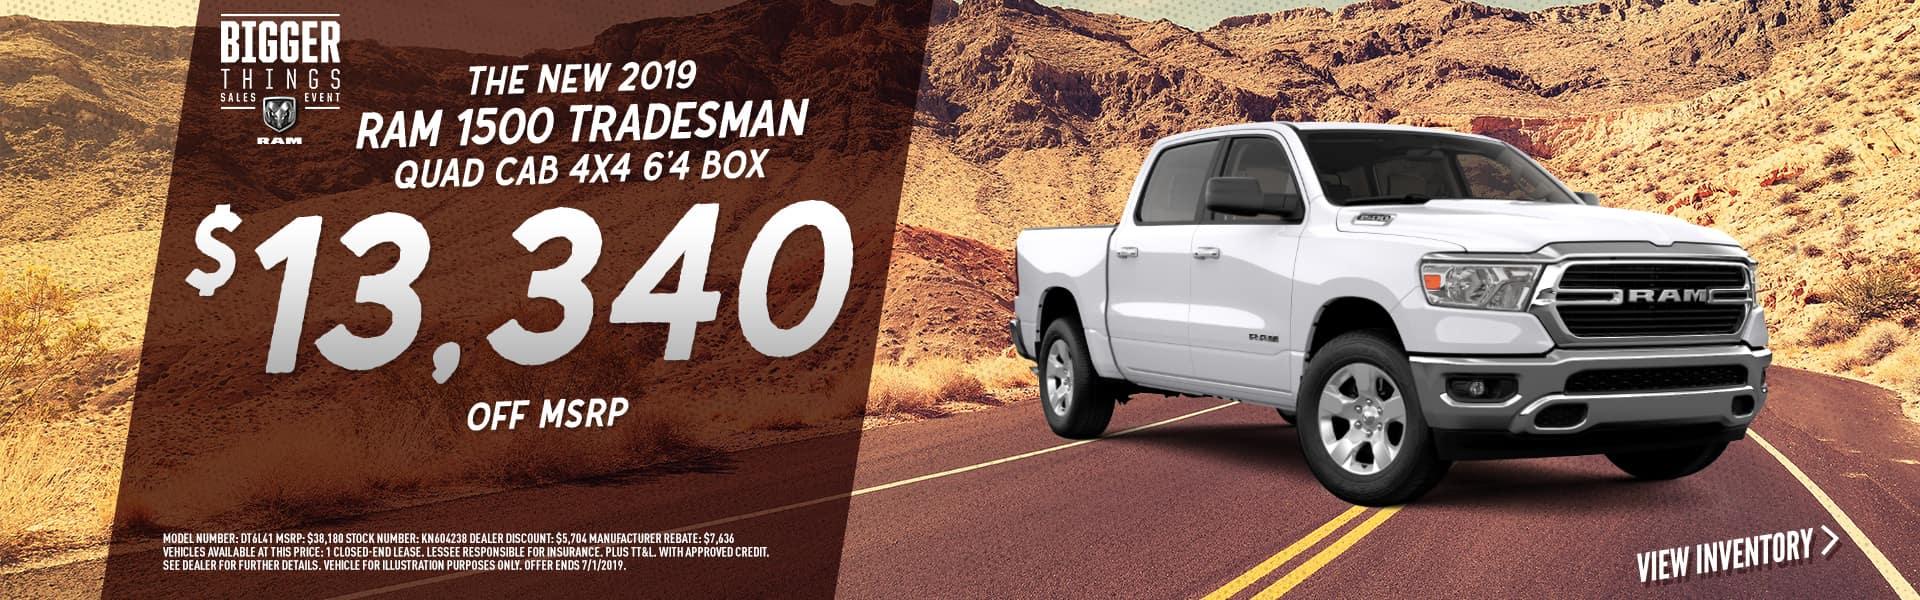 lease-2019-ram-1500-tradesman-quad-cab-4x4-box-tulsa